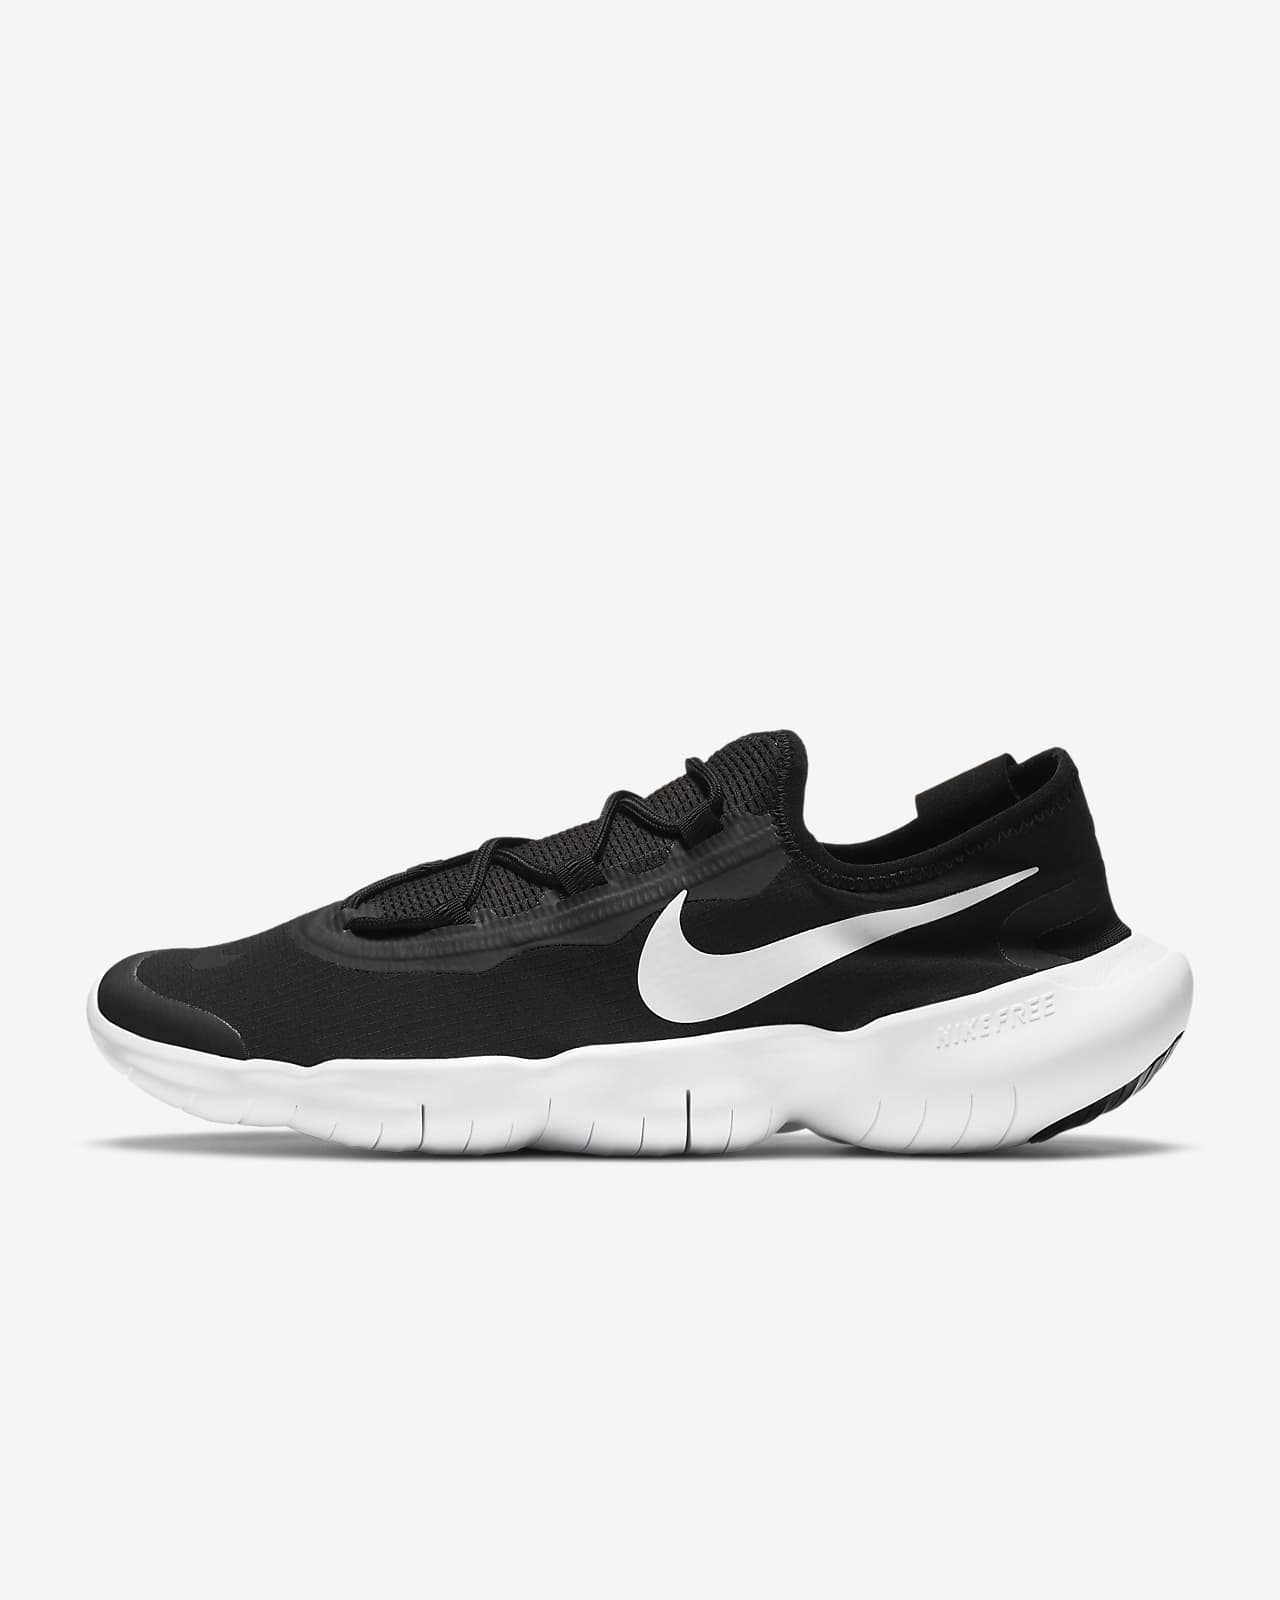 Nike Free RN 5.0 2020 男子跑步鞋